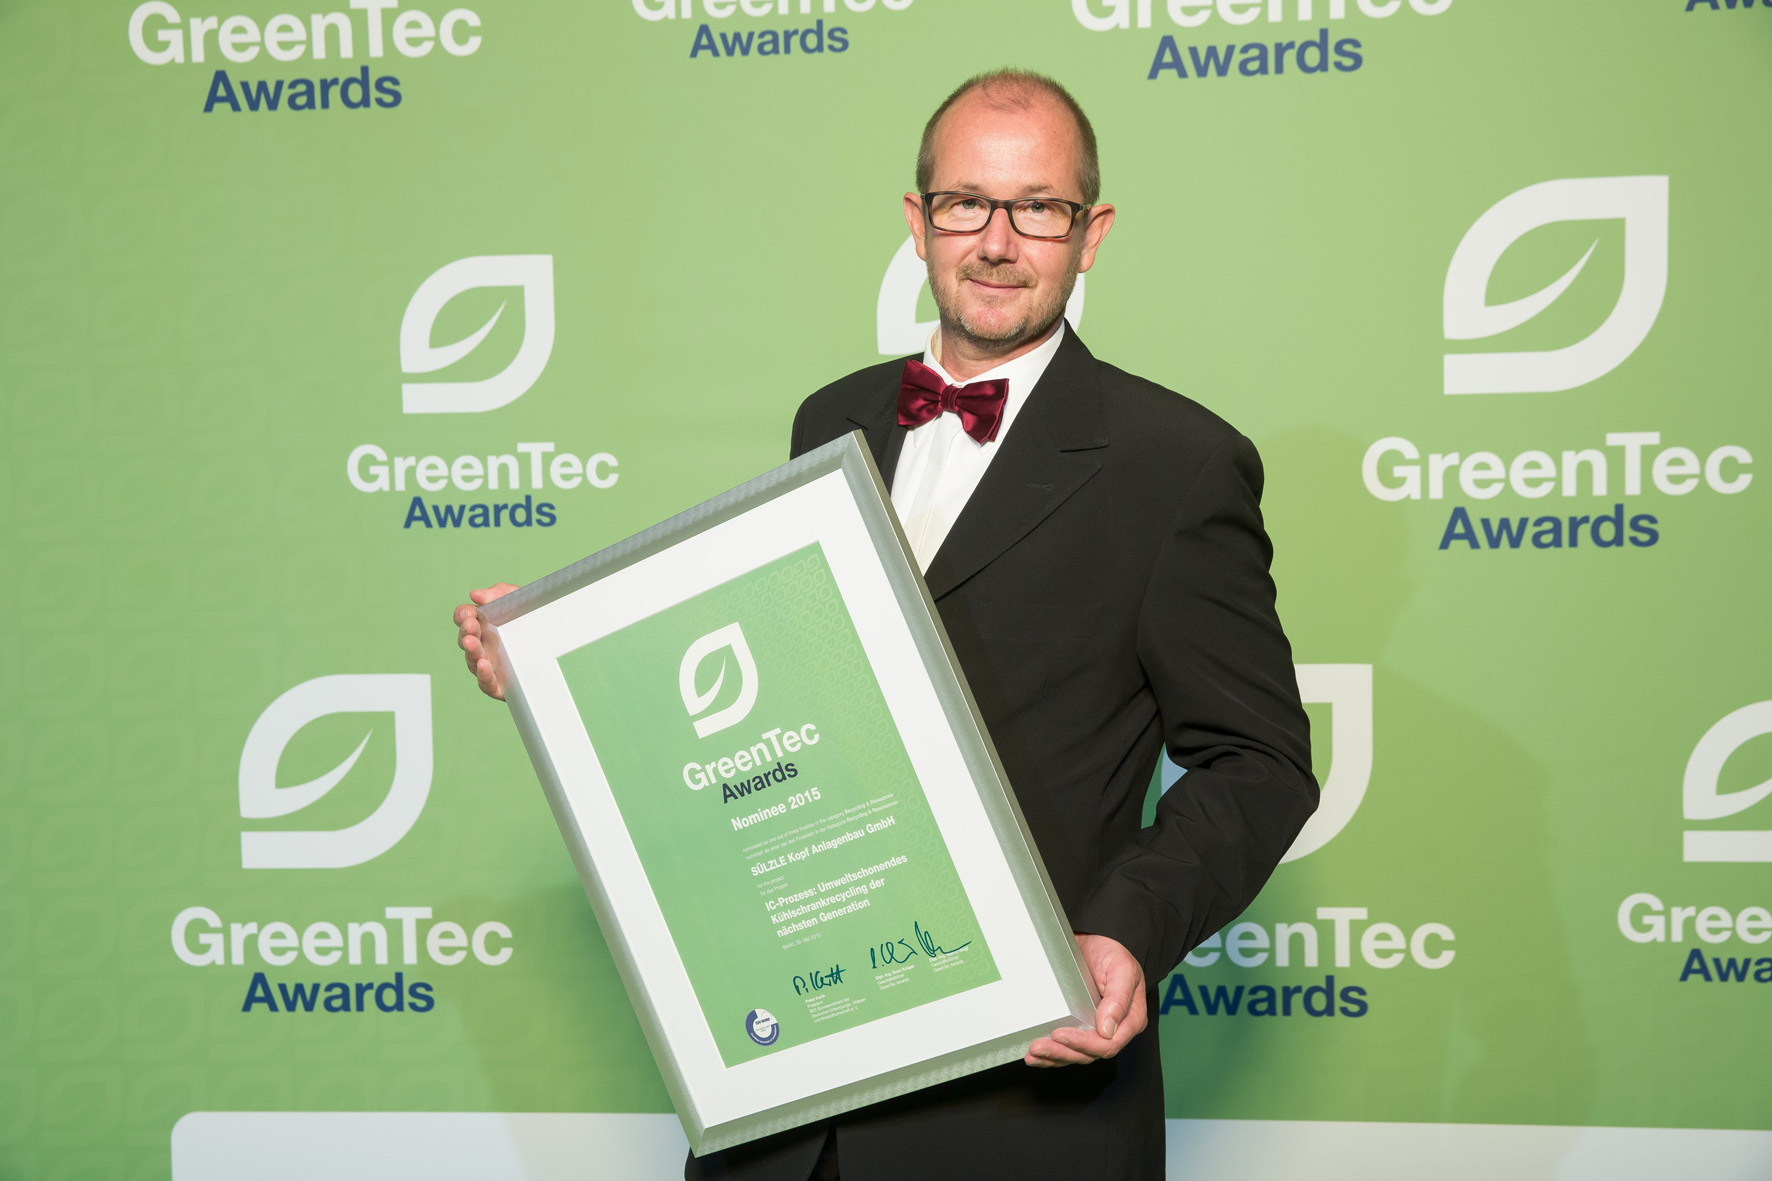 greentec award 2015 peter althaus suelzle kopf anlagenbau